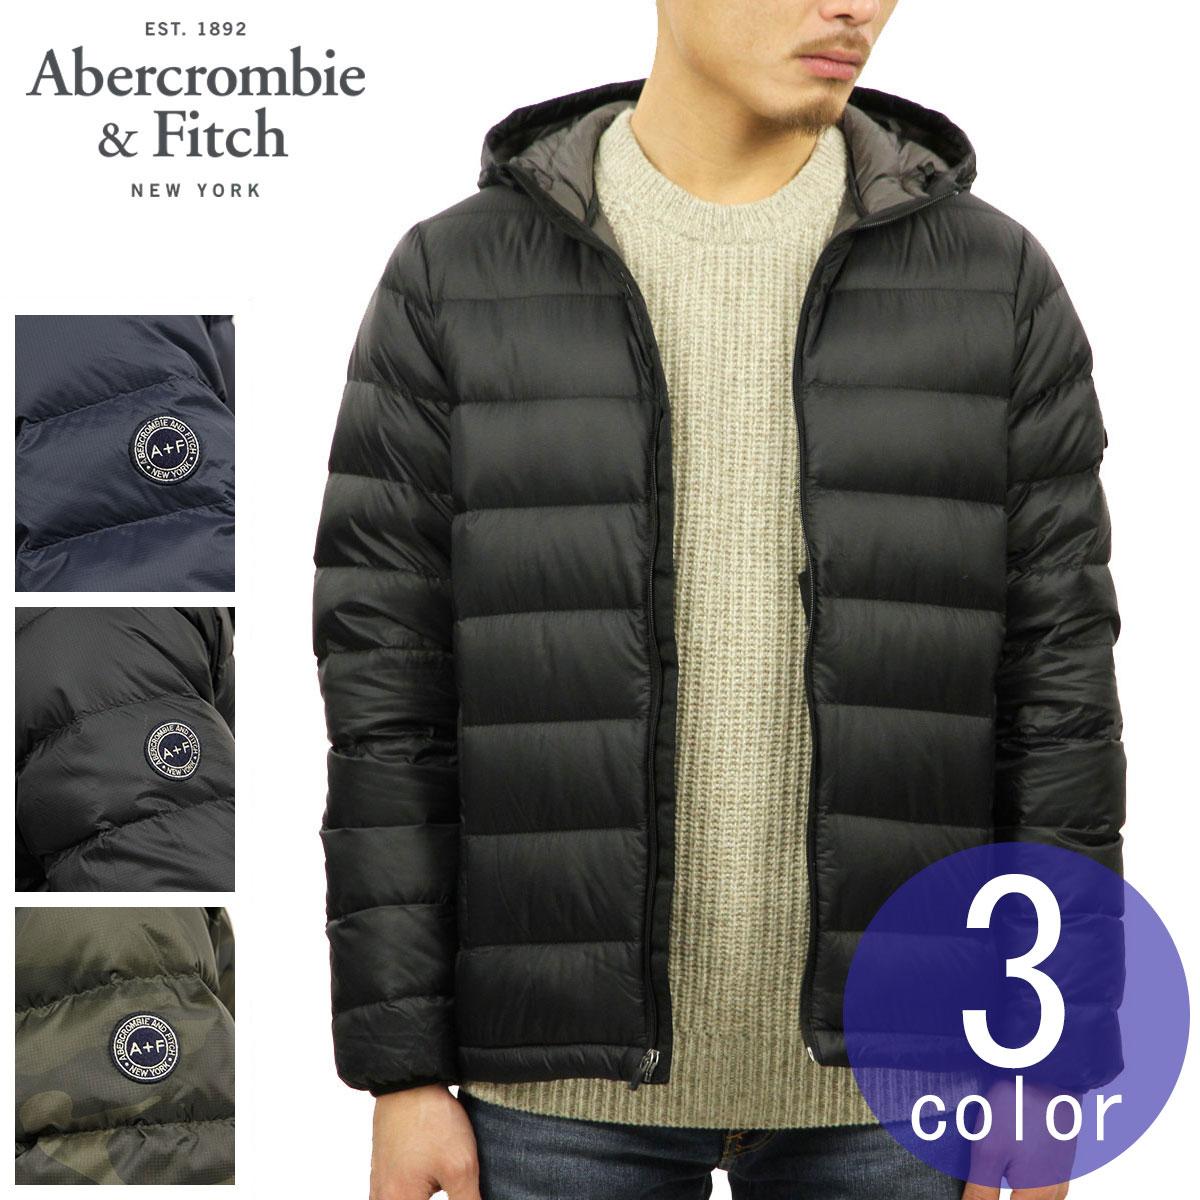 3c24dbd86 ABBA black outer men's regular article Abercrombie & Fitch jacket light  weight down jacket compact storing LIGHTWEIGHT HOODED PUFFER JACKET